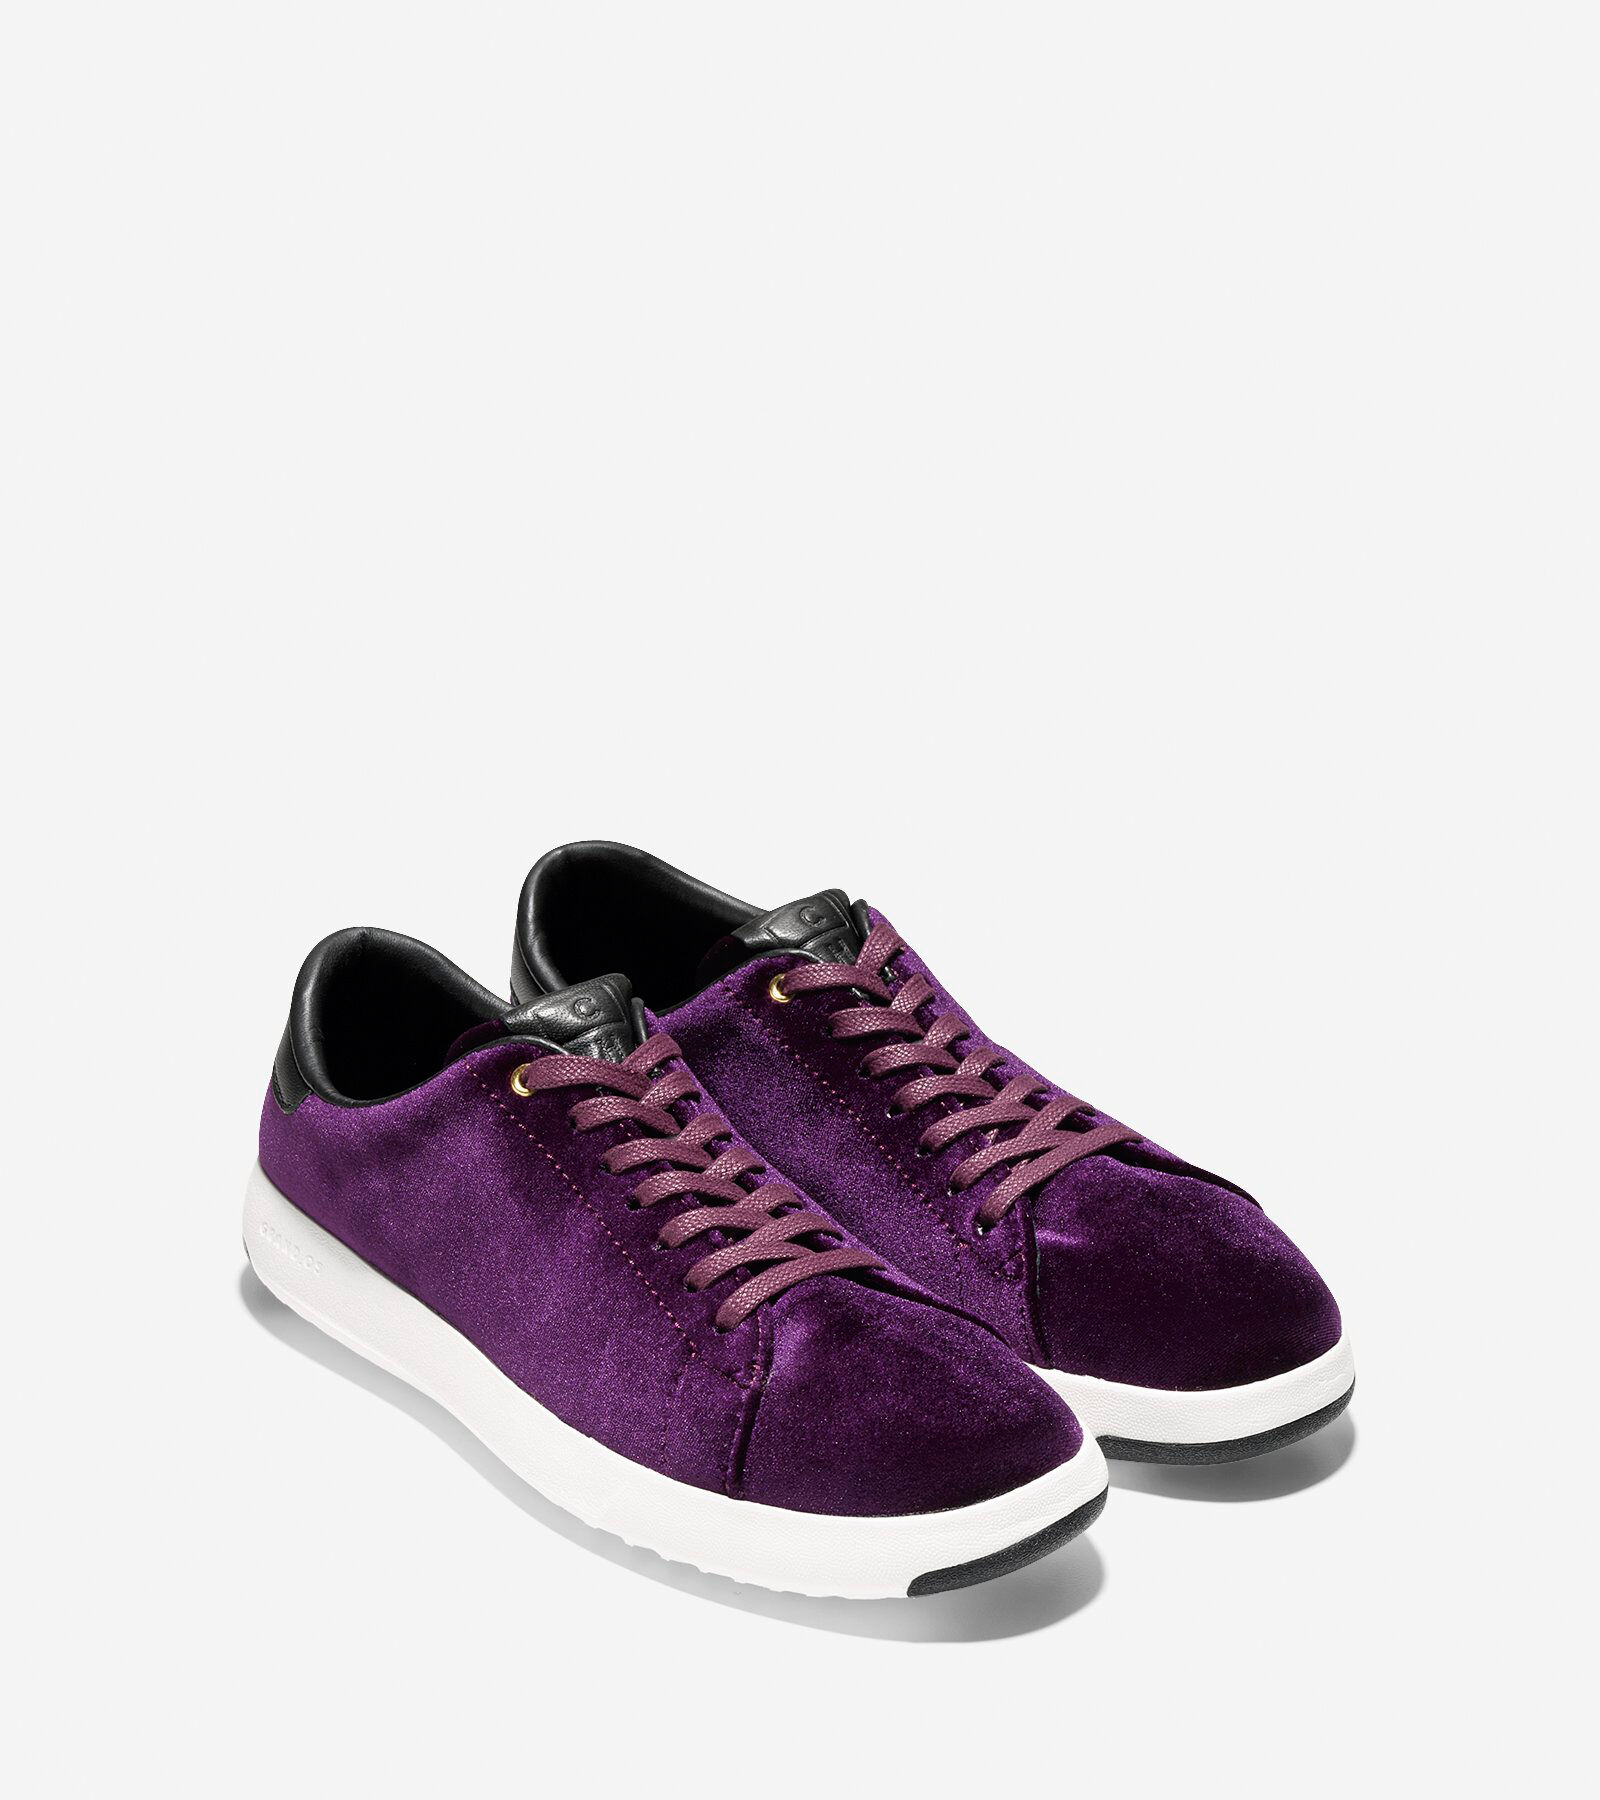 ... Women's GrandPrø Tennis Sneaker; Women's GrandPrø Tennis Sneaker. # colehaan